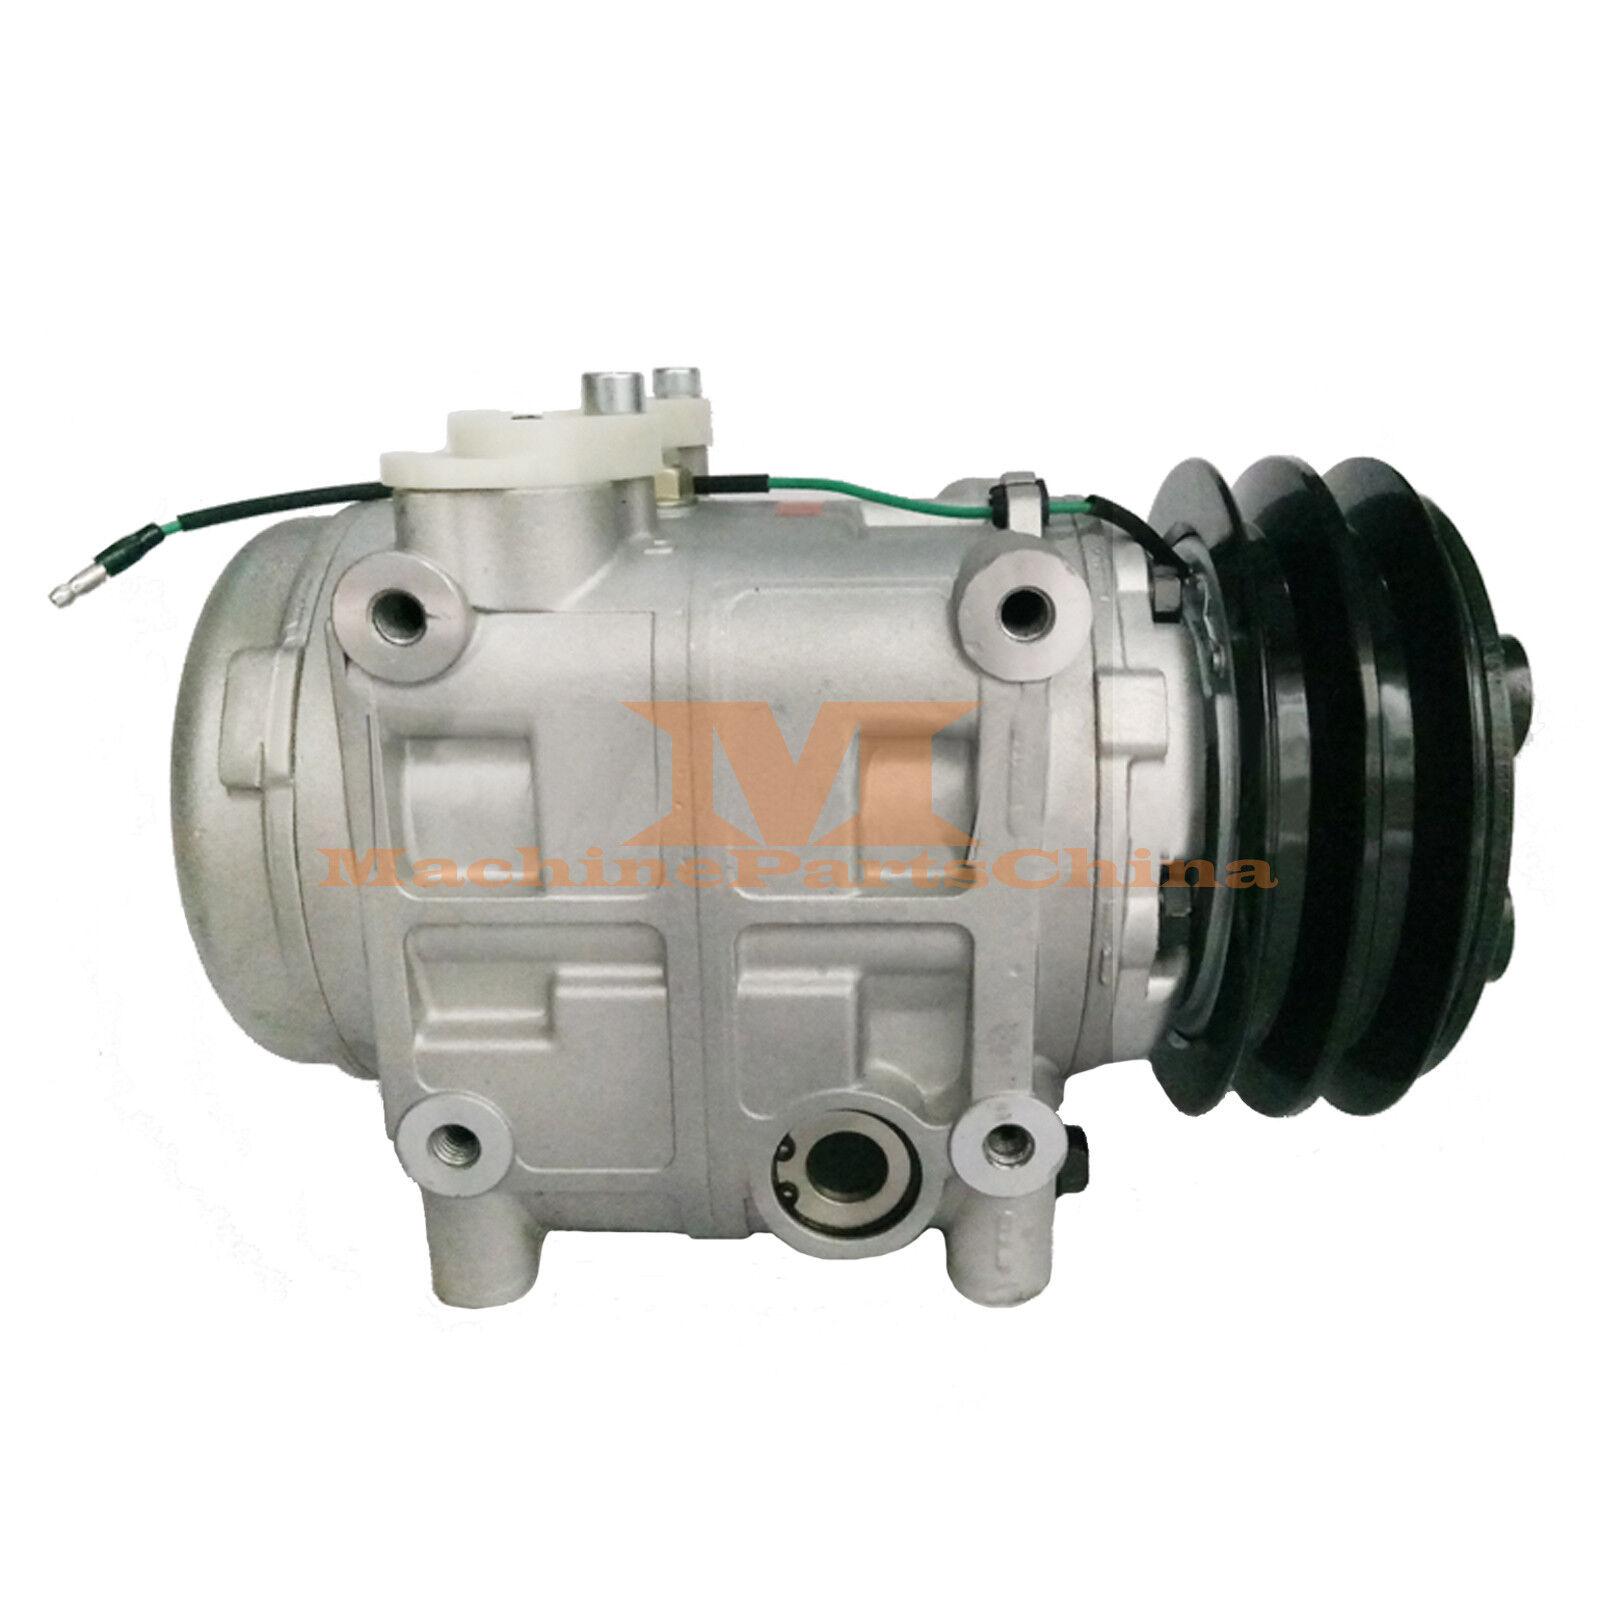 Car Ac Compressor >> Details About Car Ac Compressor Pump Dks32ch Tm31 For Nissan Mini Bus 506010 1720 506210 0511